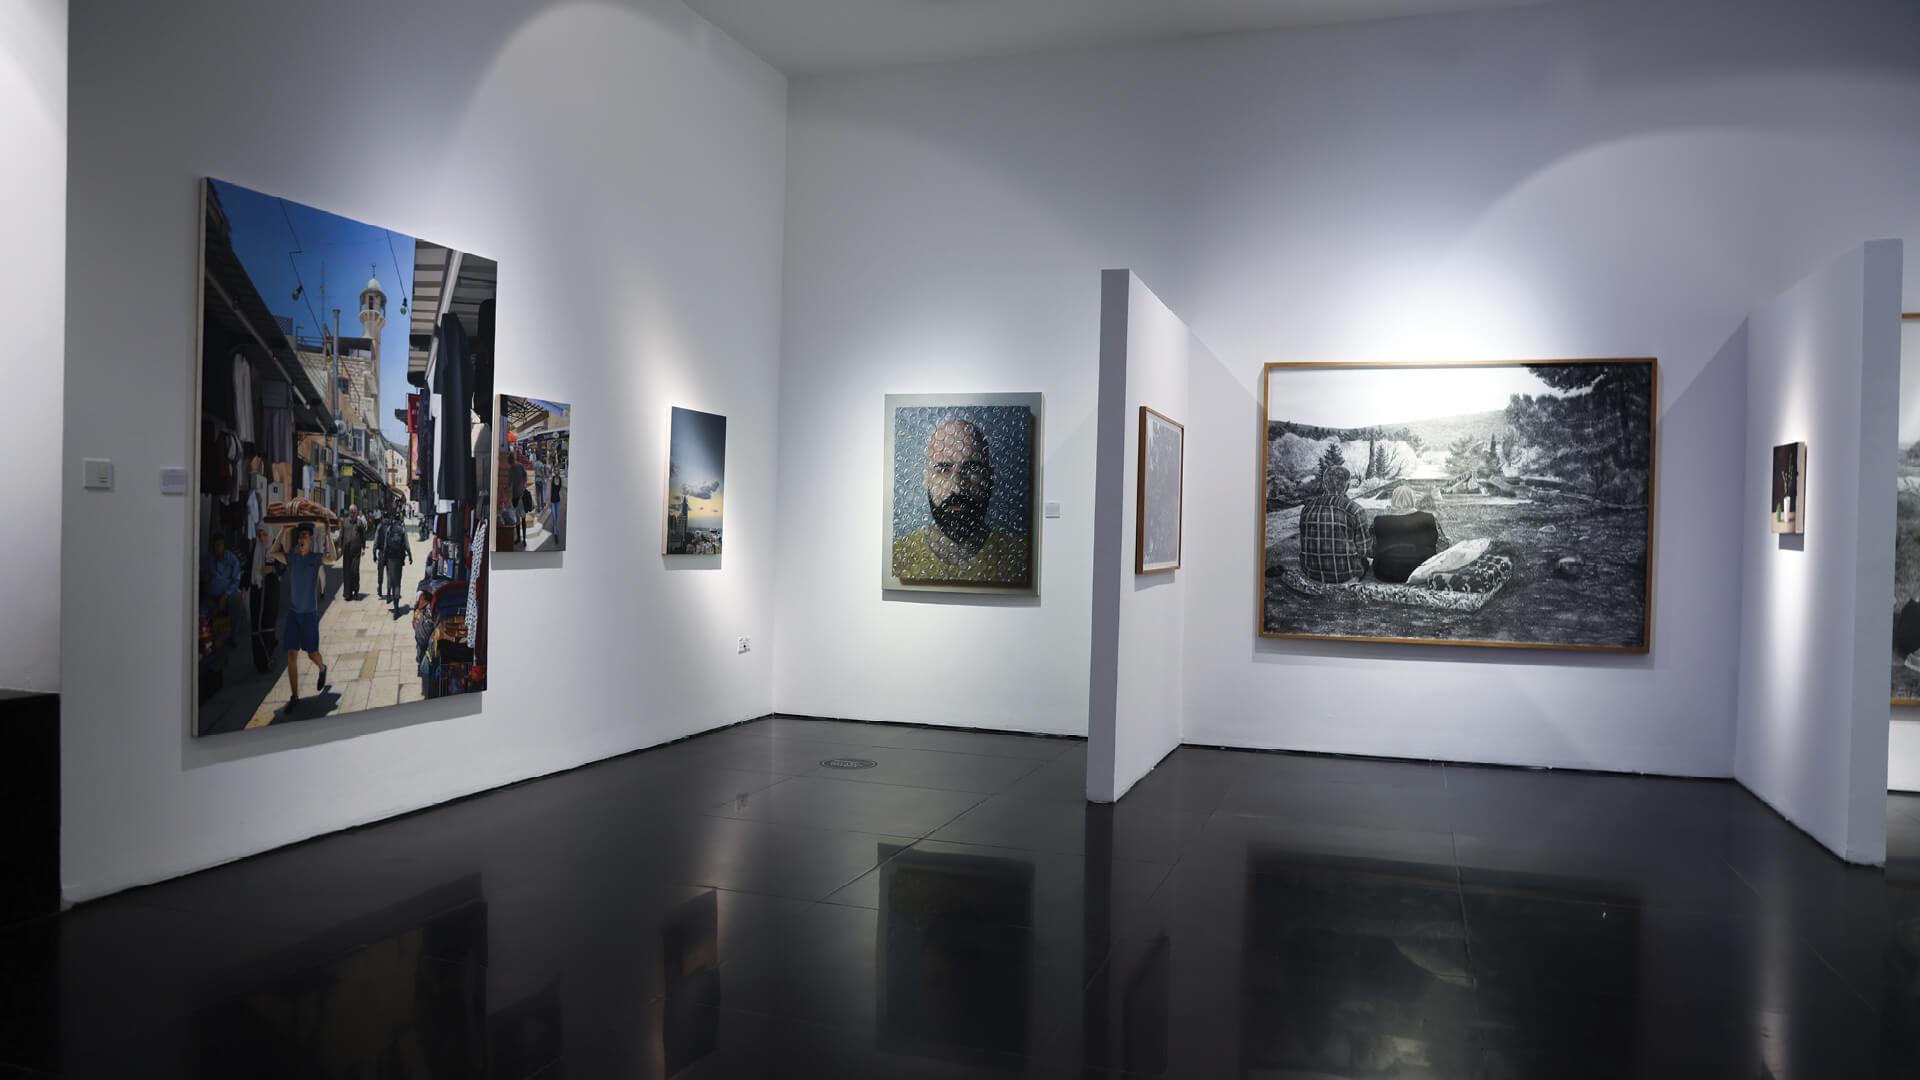 Michael Halak and Samah Shihadi tell tales of their land through a hyperrealist lens